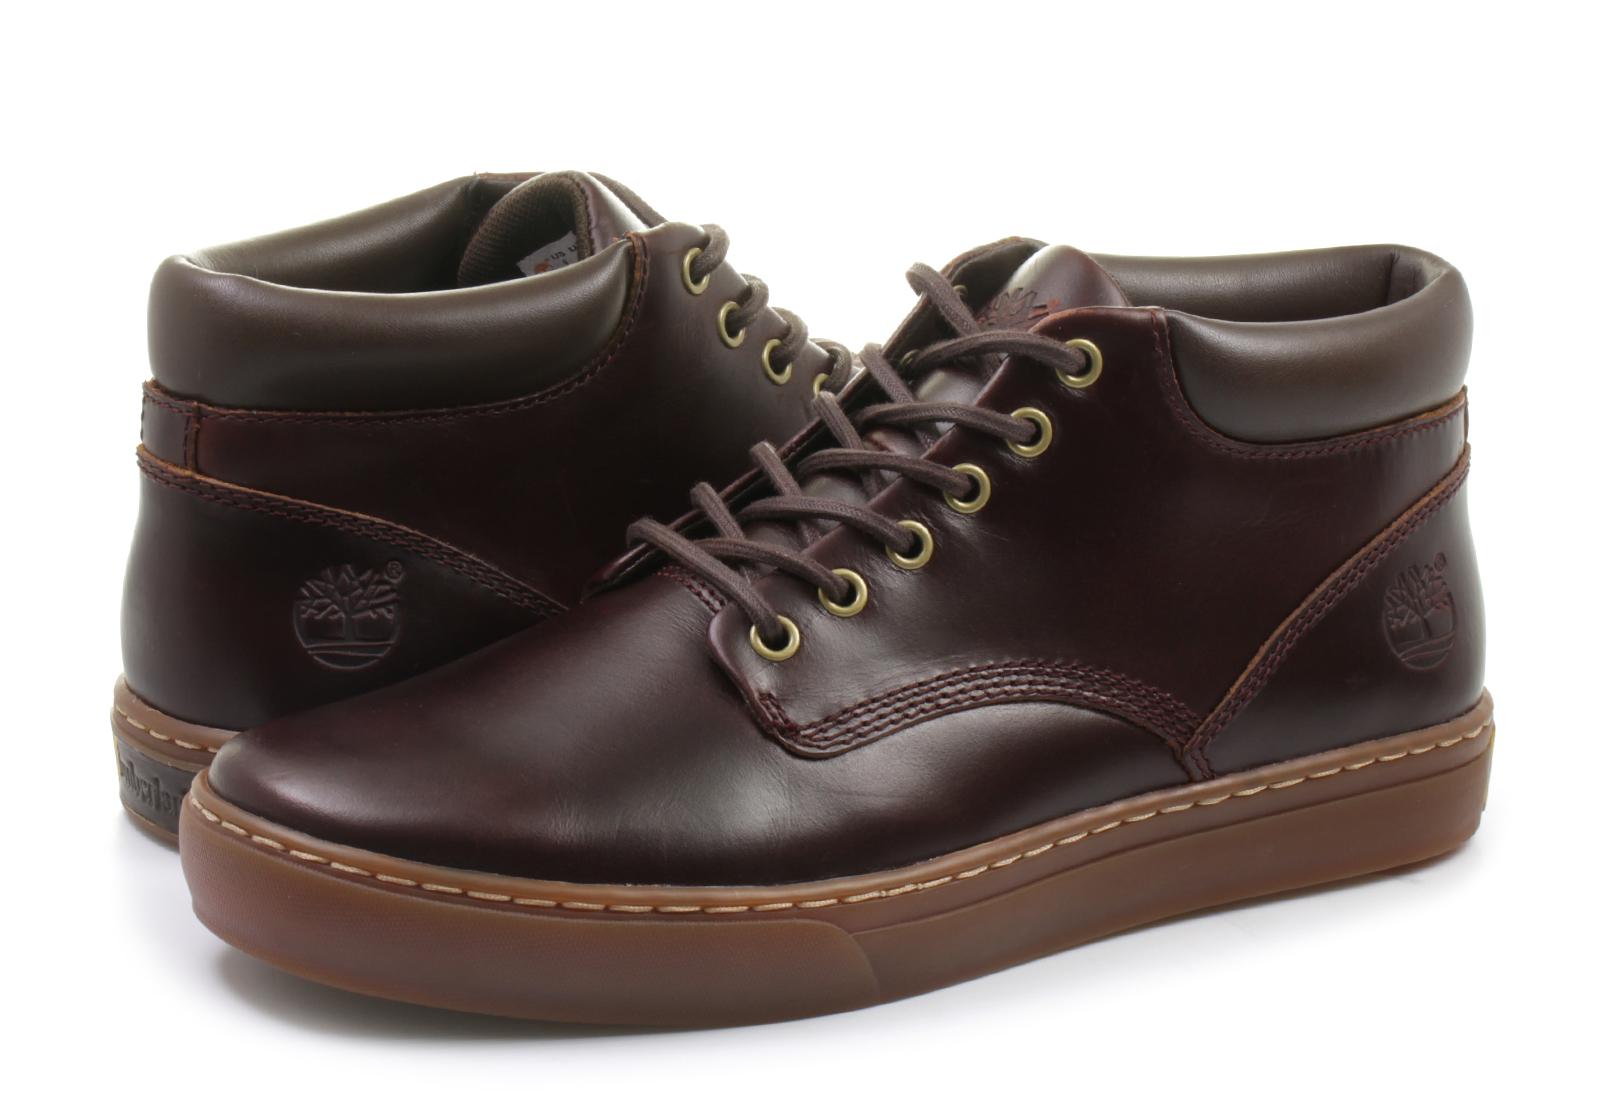 Simple Timberland Nellie Chukka Double Dark Brown Womens Boots   EBay